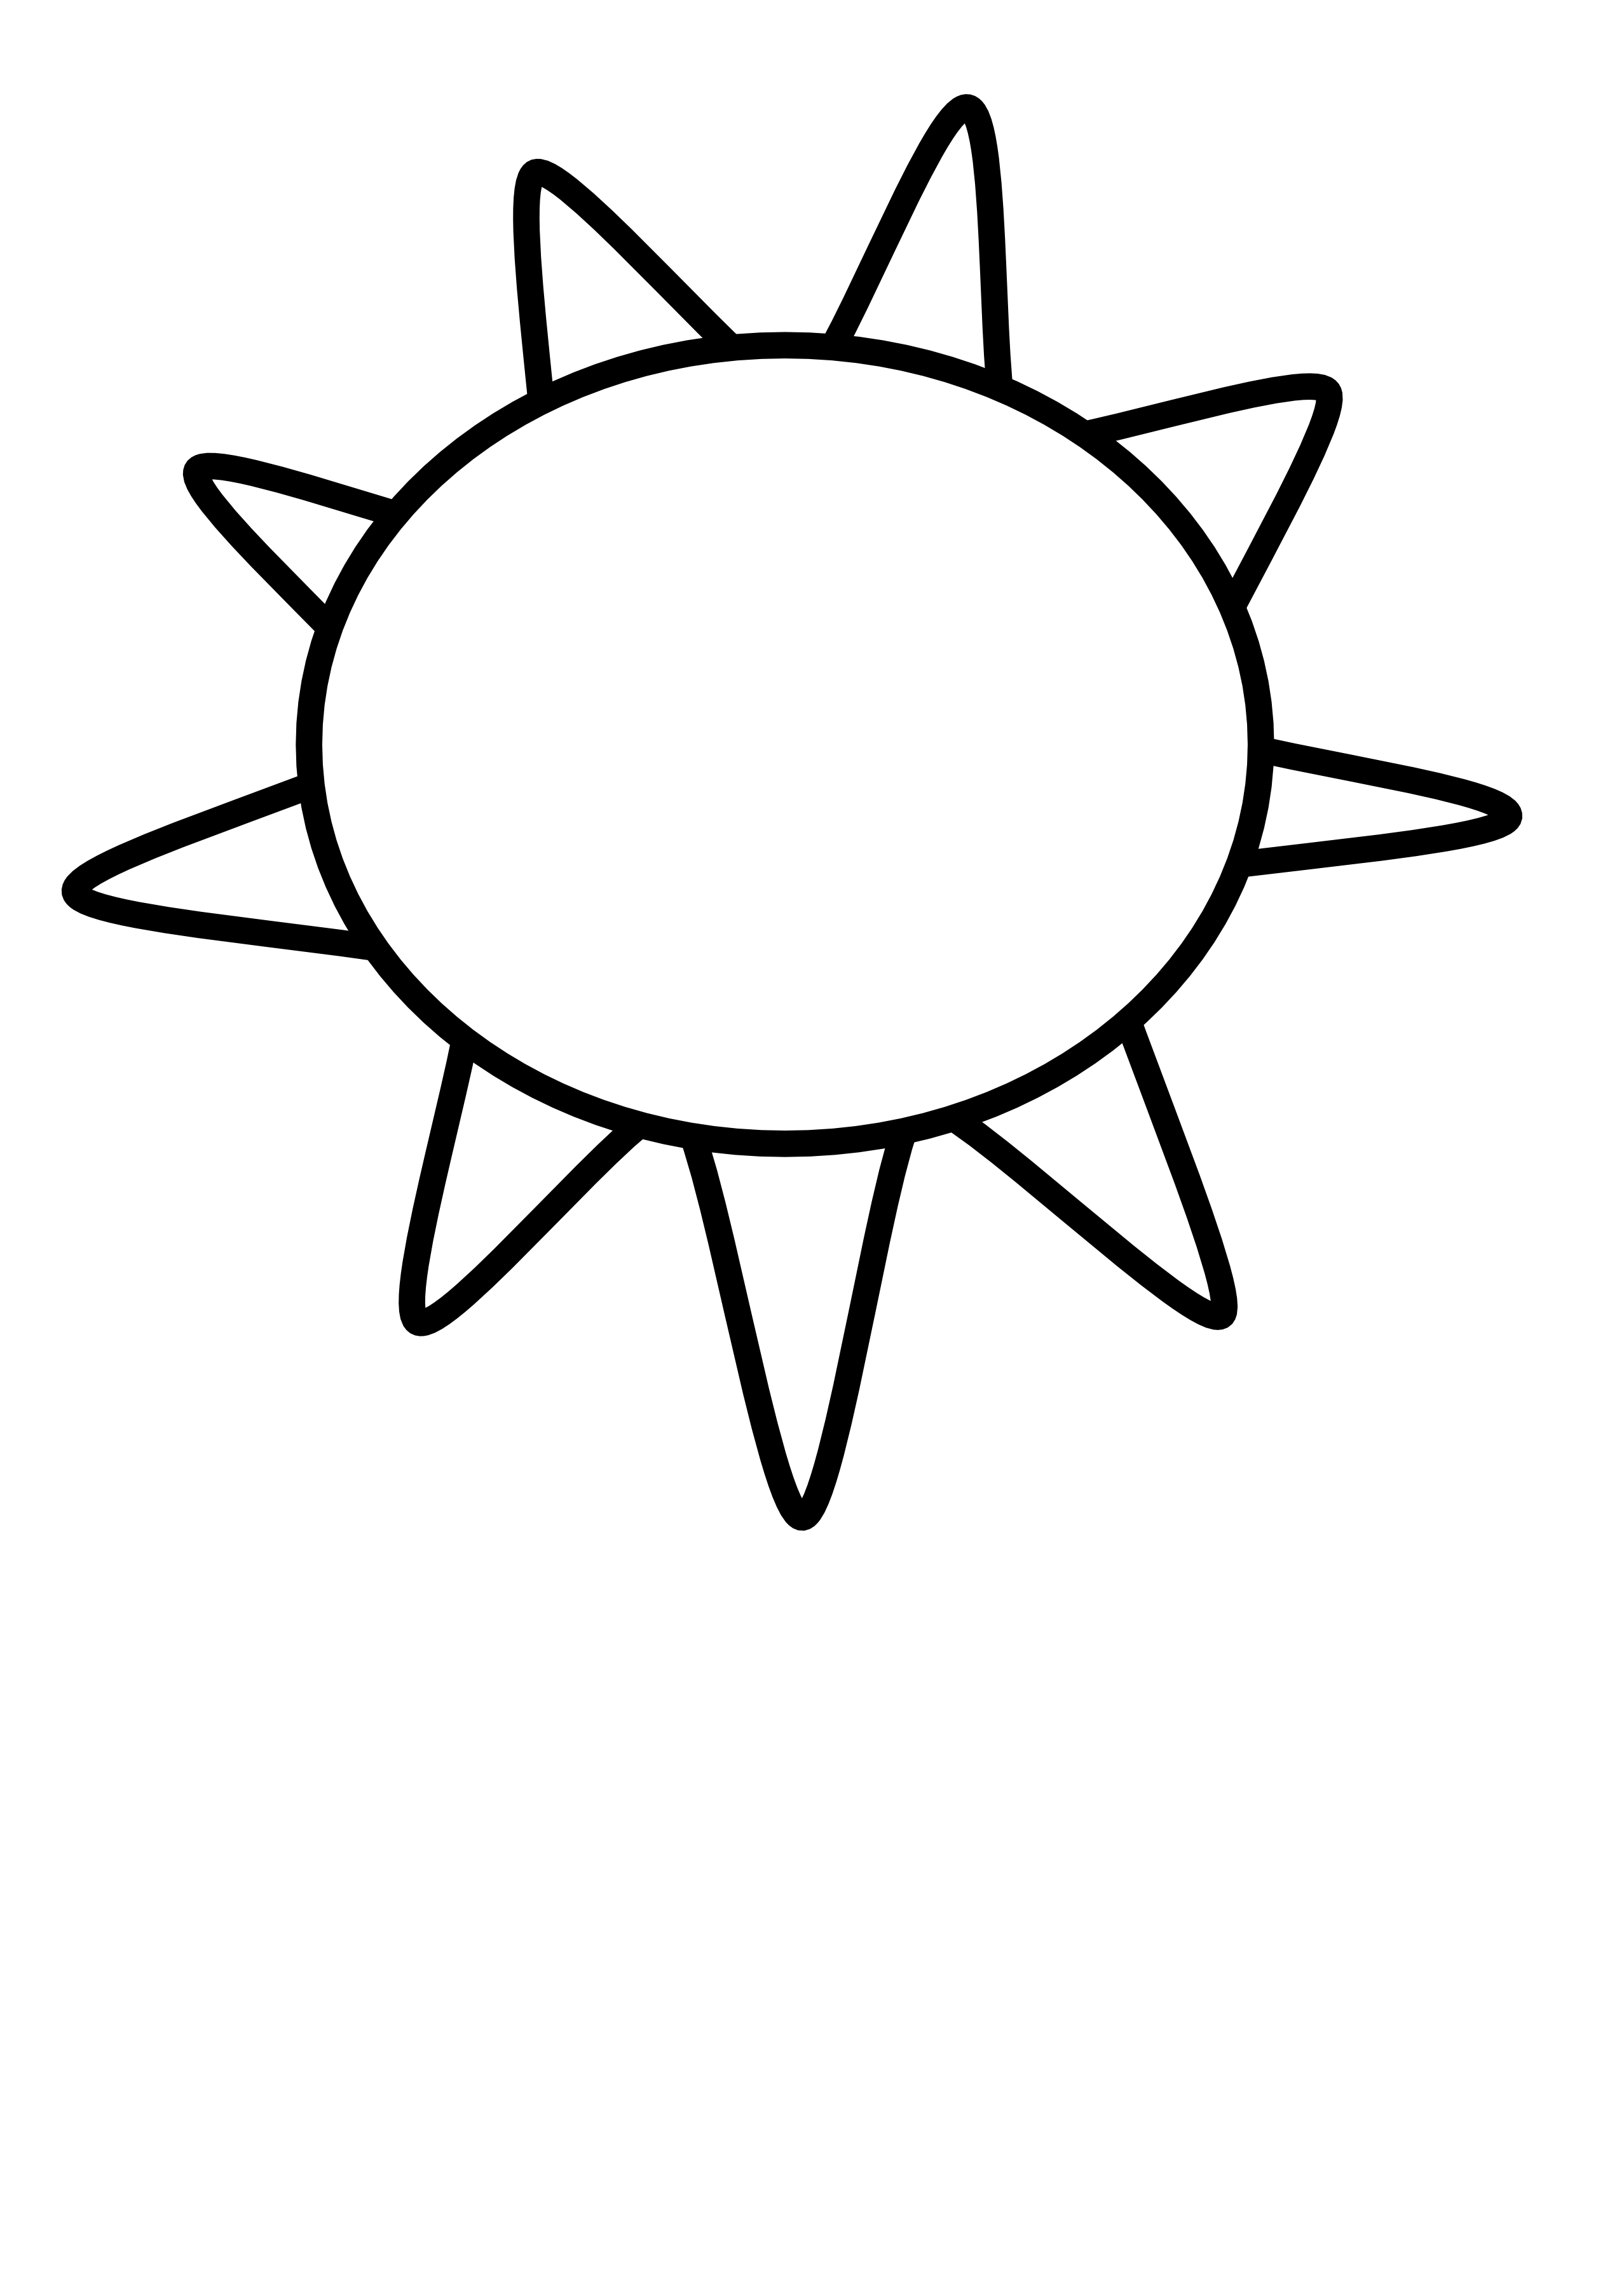 Sun Clip Art Black And White Sun Outline-Sun Clip Art Black And White Sun Outline Black White Line Art Coloring-11